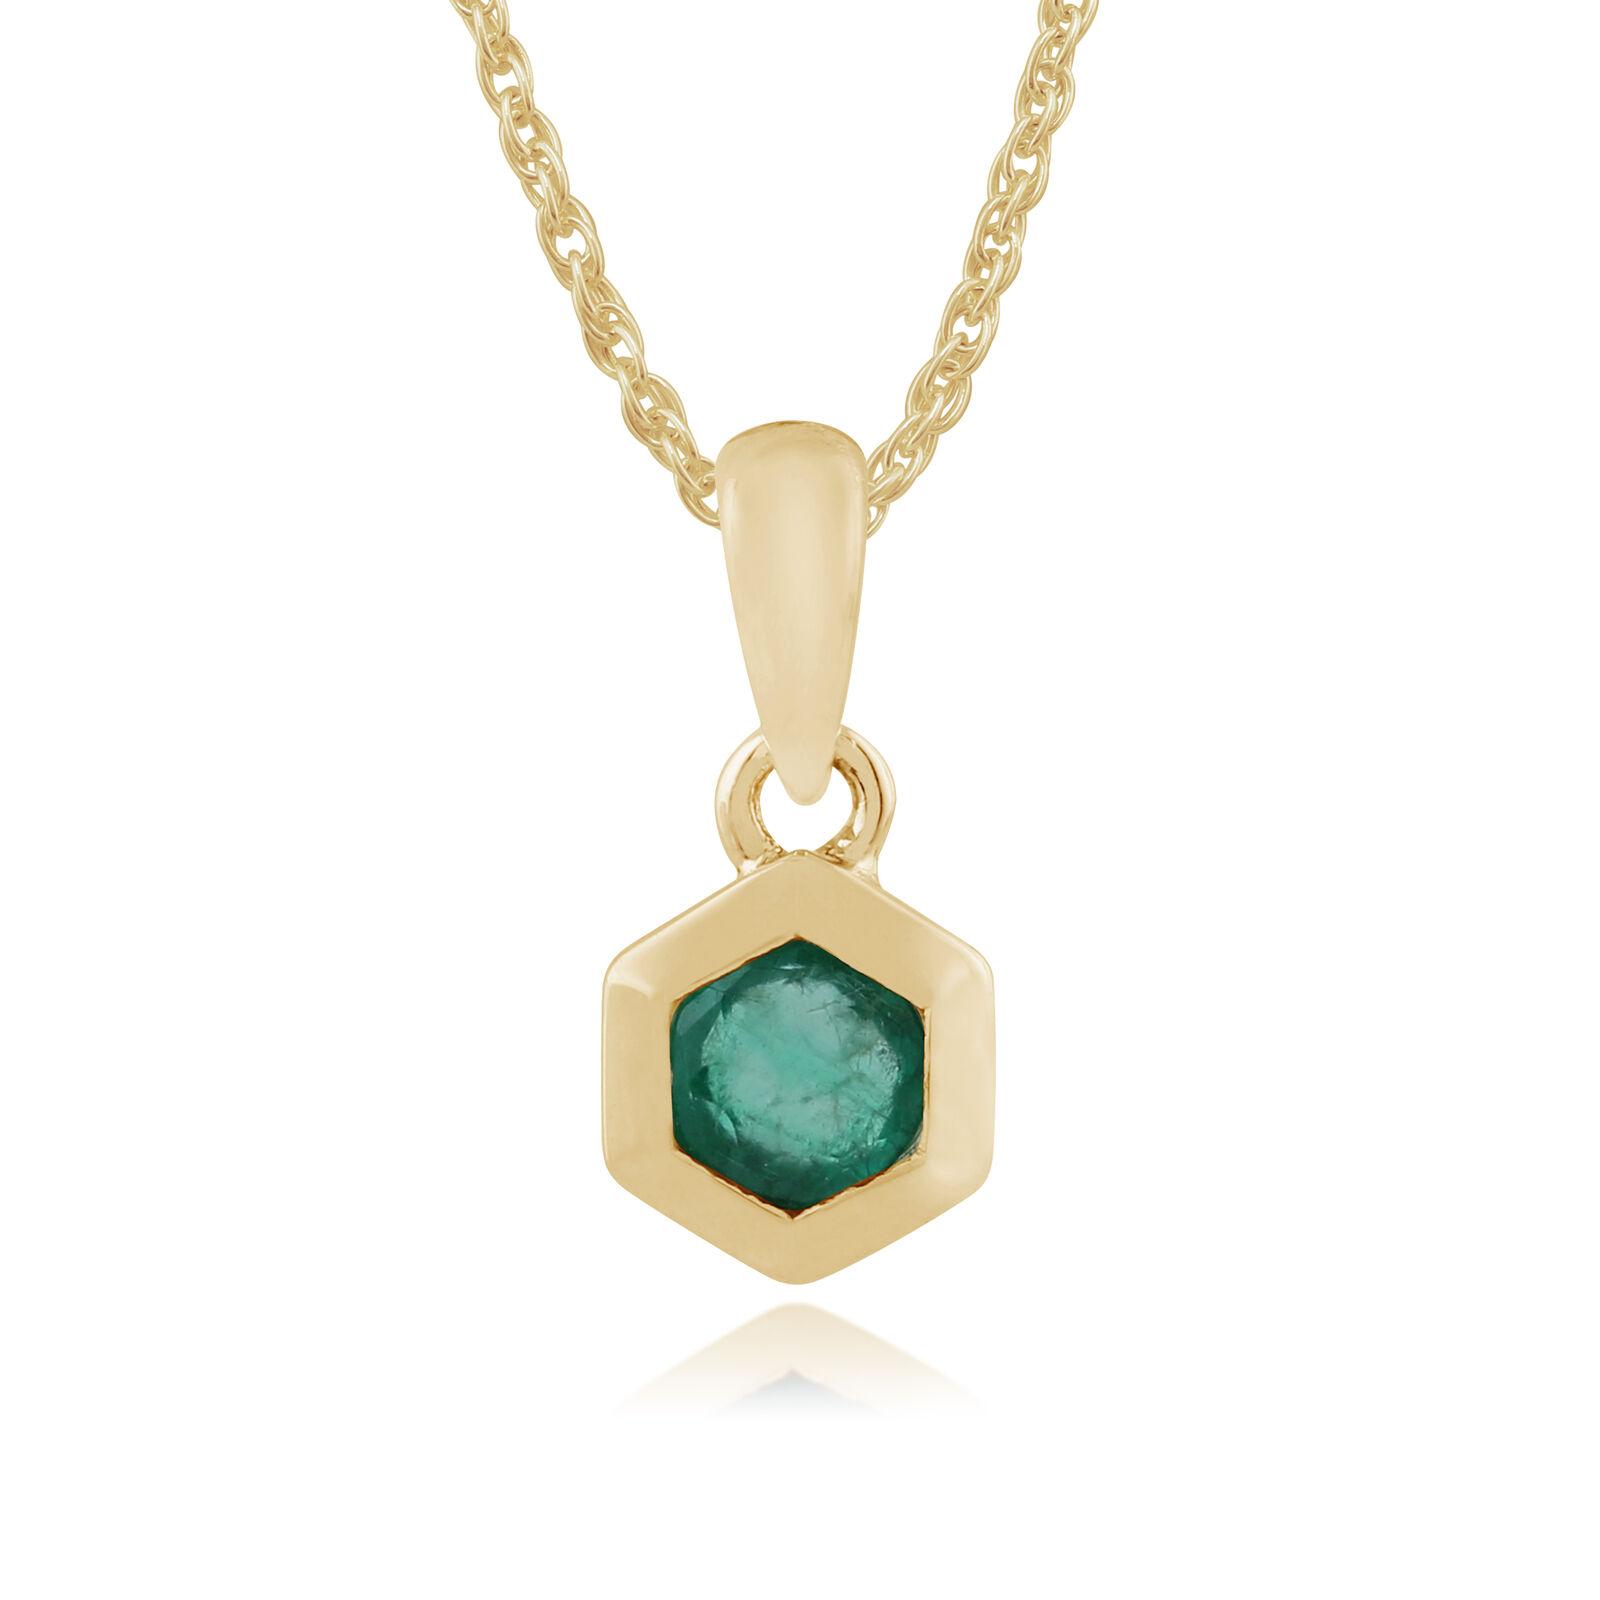 Gemondo 9ct Yellow gold 0.23ct Emerald Hexagon Pendant on Chain